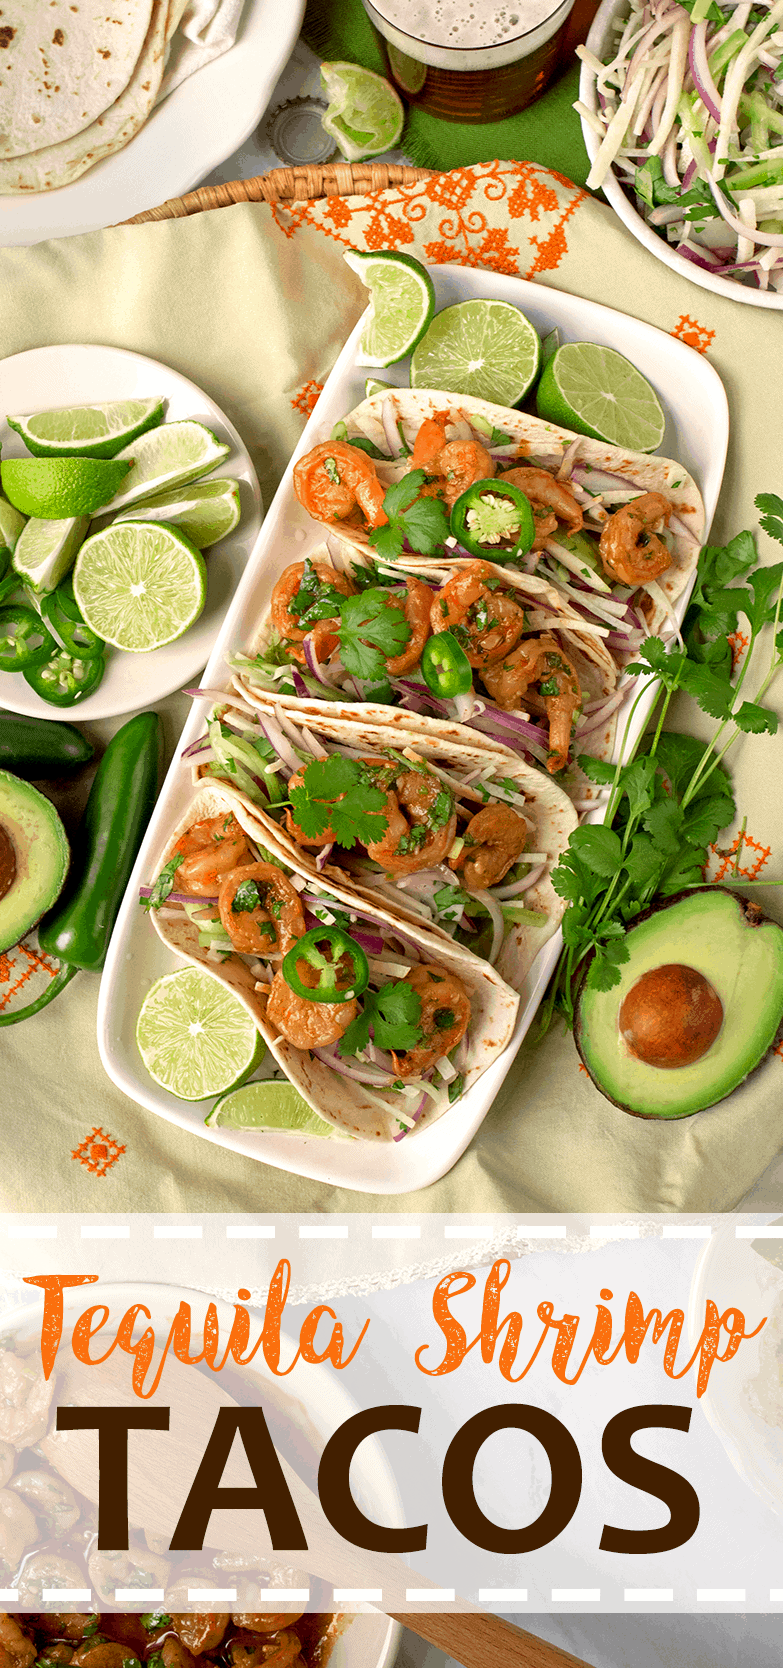 Tequila Shrimp Tacos Pin - Tequila Shrimp Tacos with Jicama Cucumber Slaw